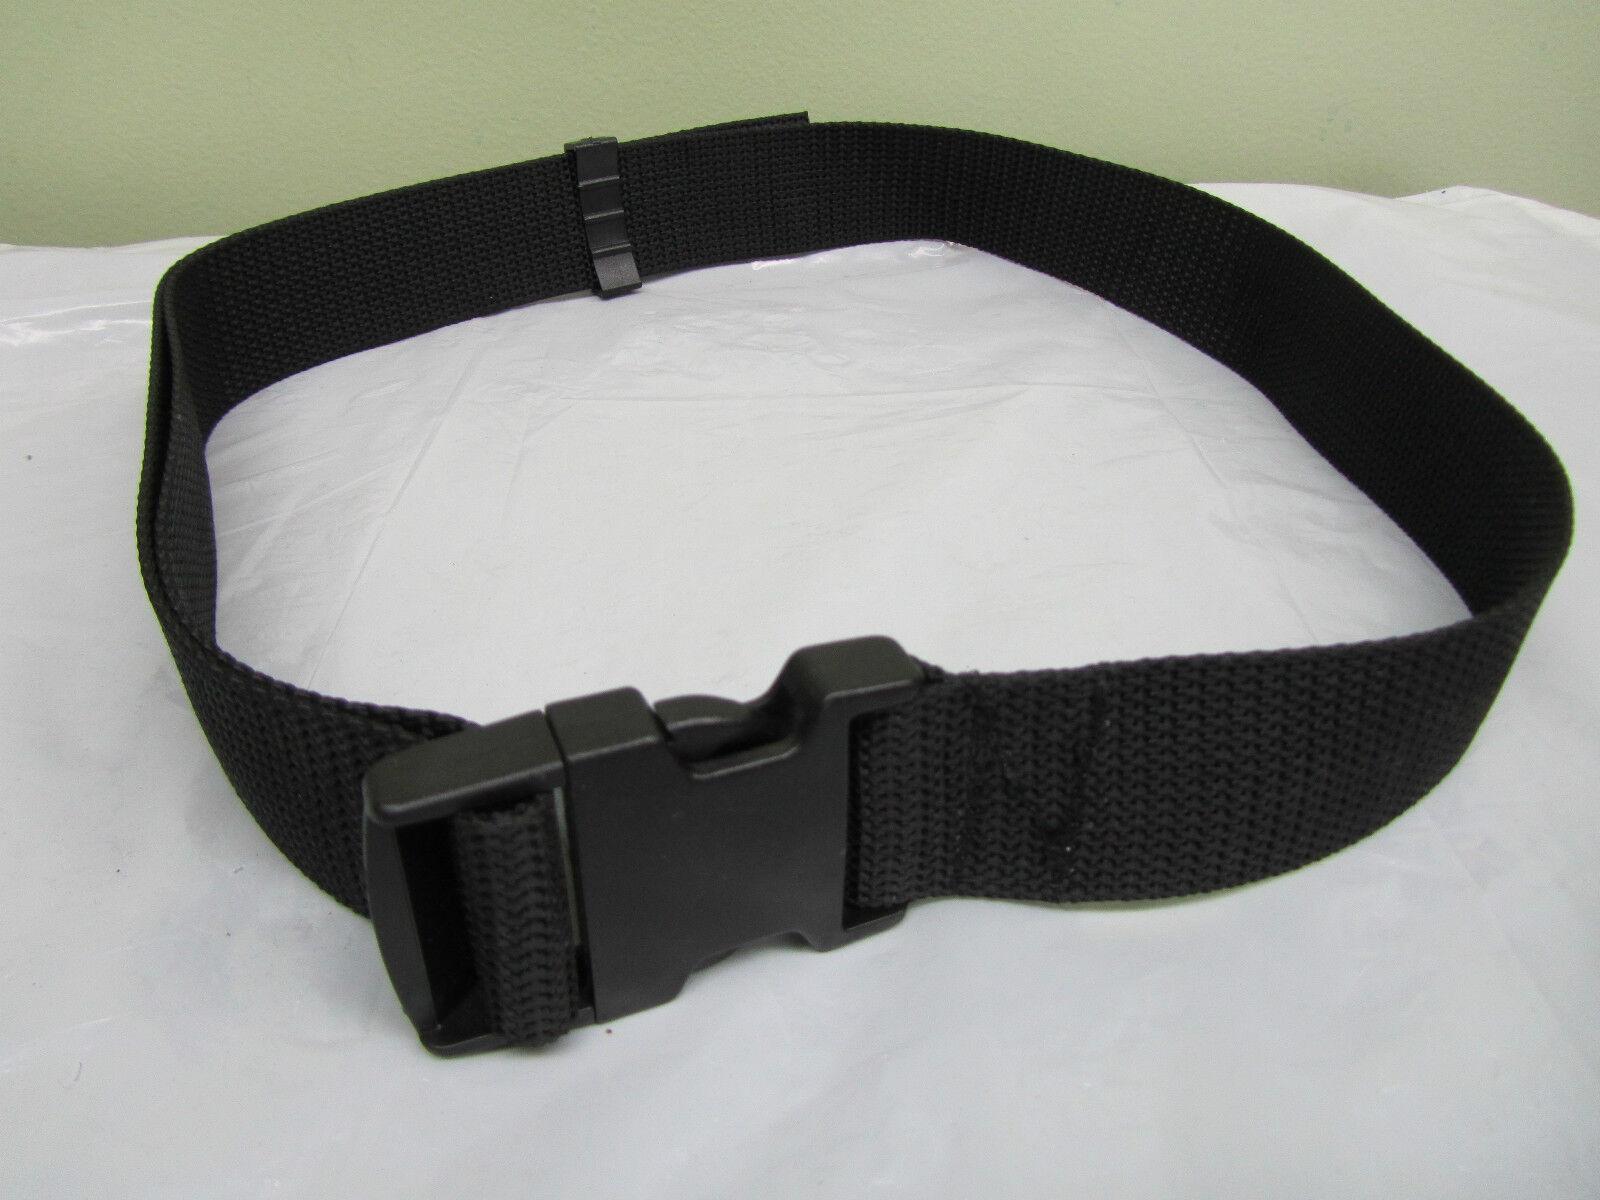 New Taylor Made Buckle Waist Multi Purposes Belt Strap Adjustable